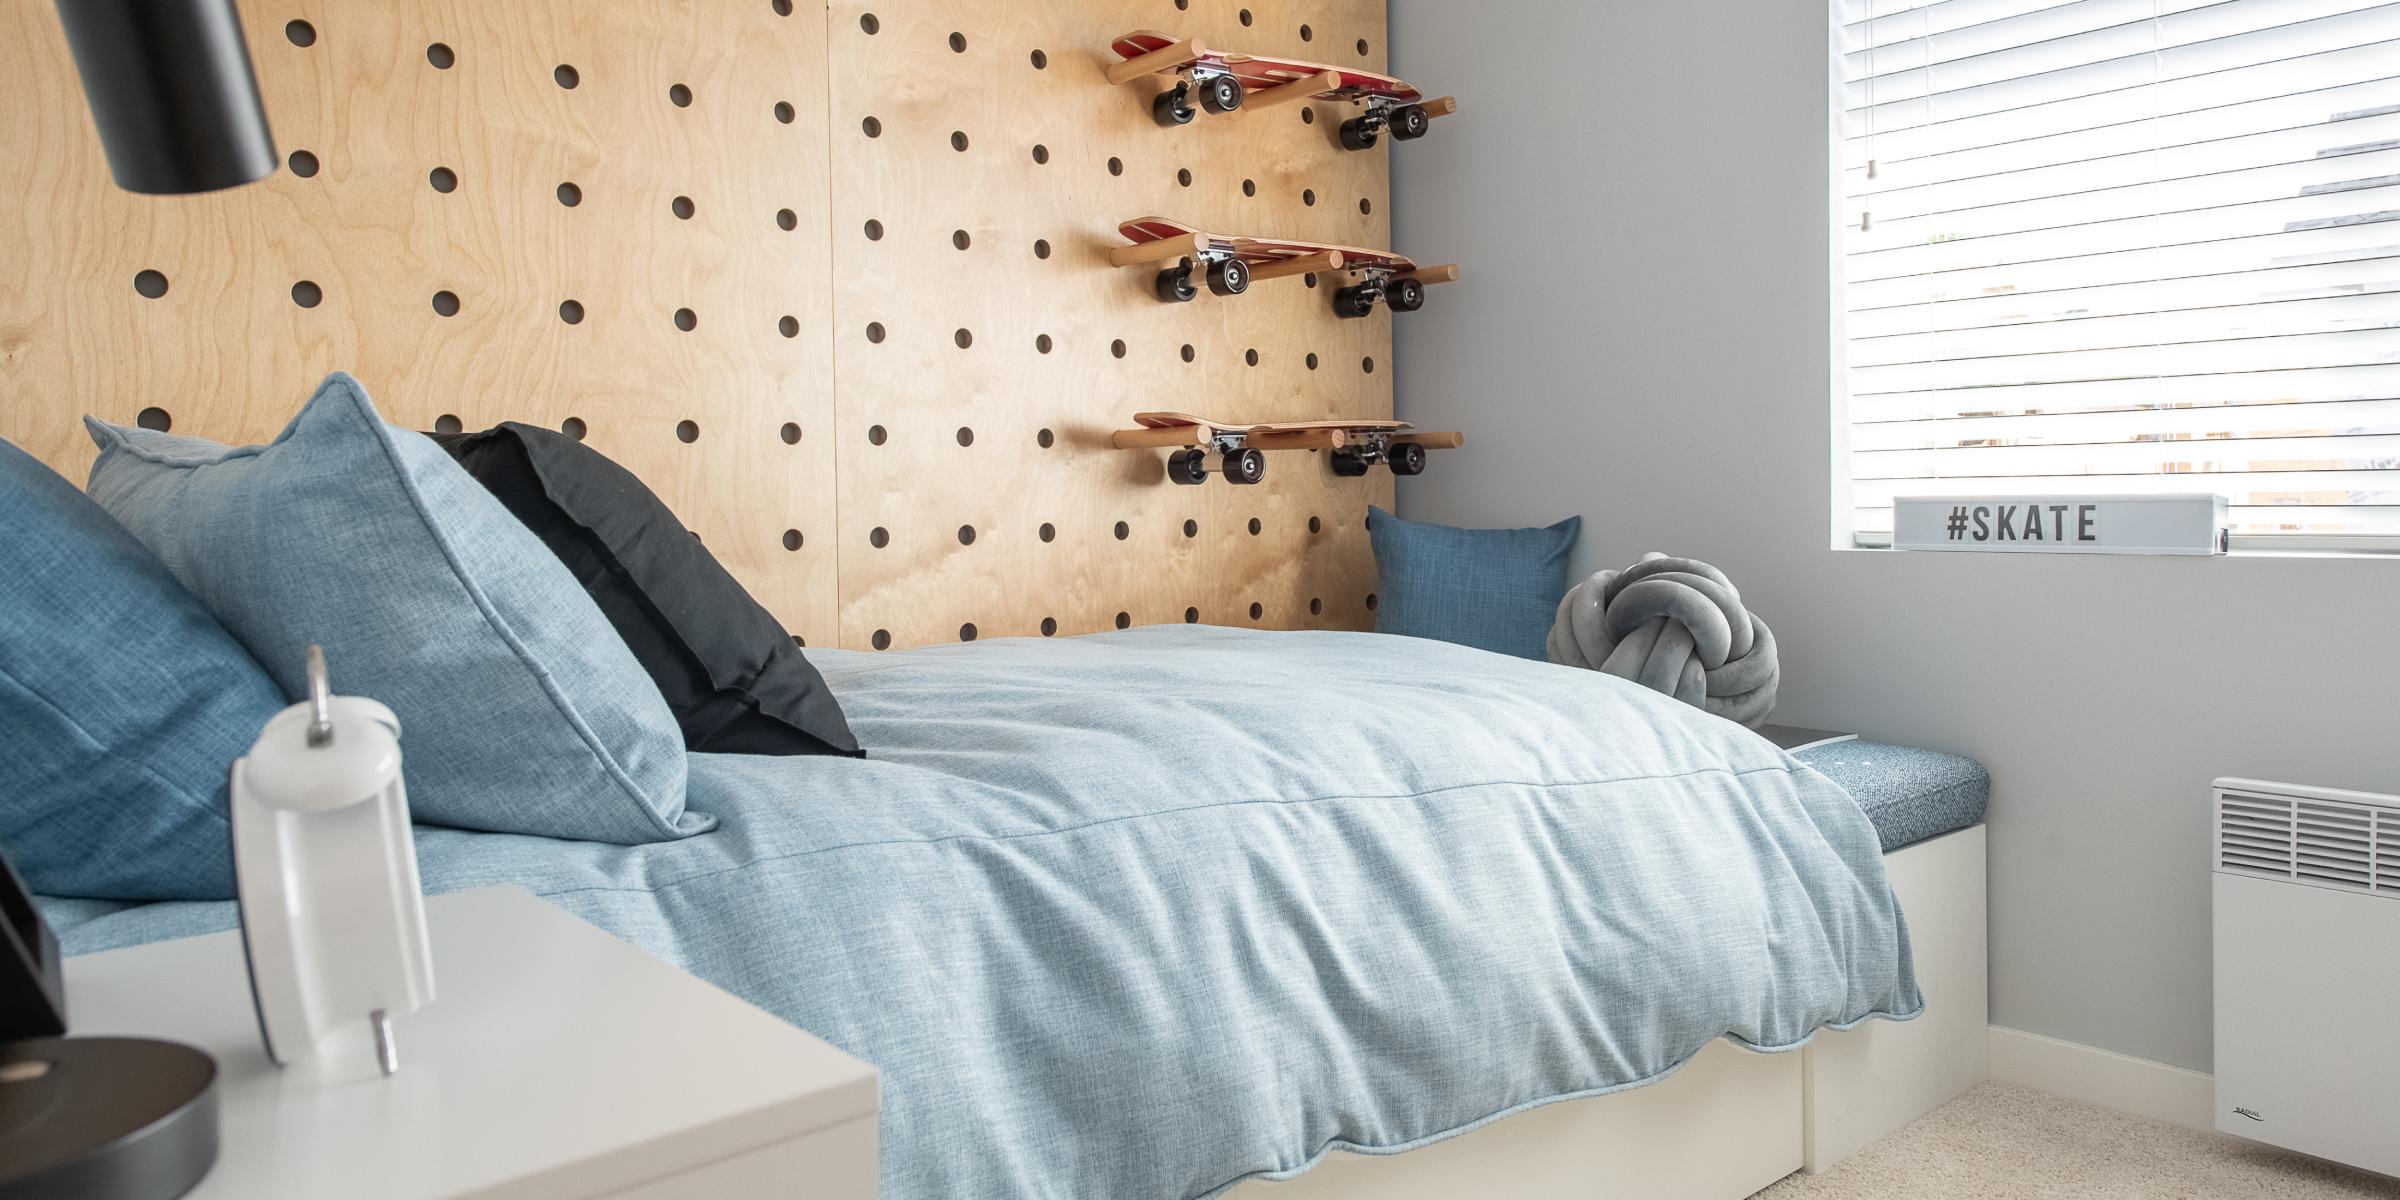 Bedroom - 11272 240 St, Maple Ridge, BC V2W 0J8, Canada!